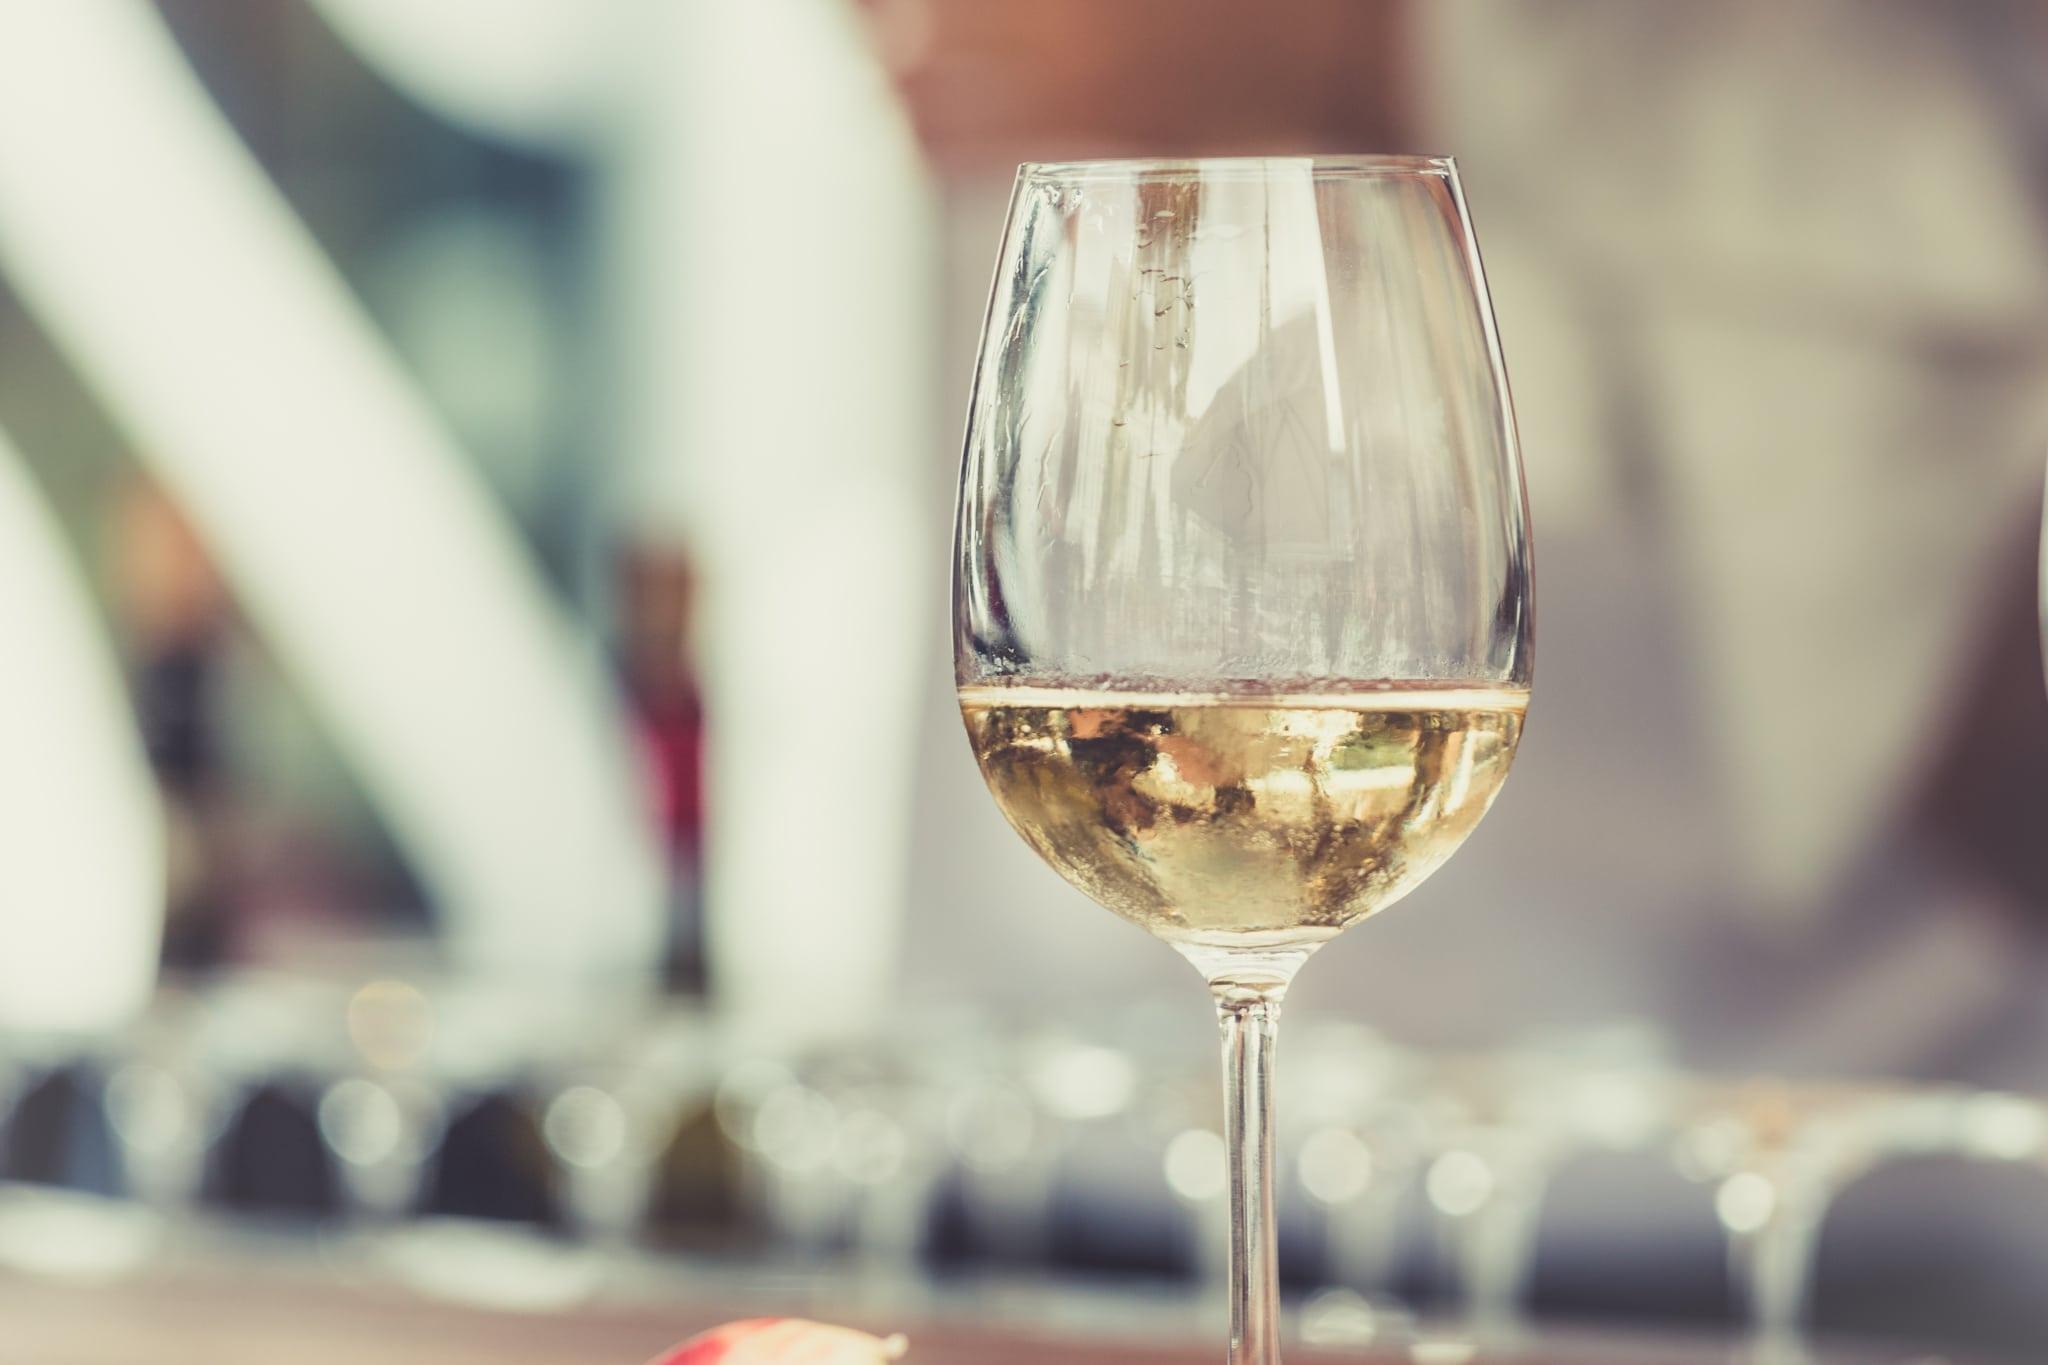 migliori vini bianchi